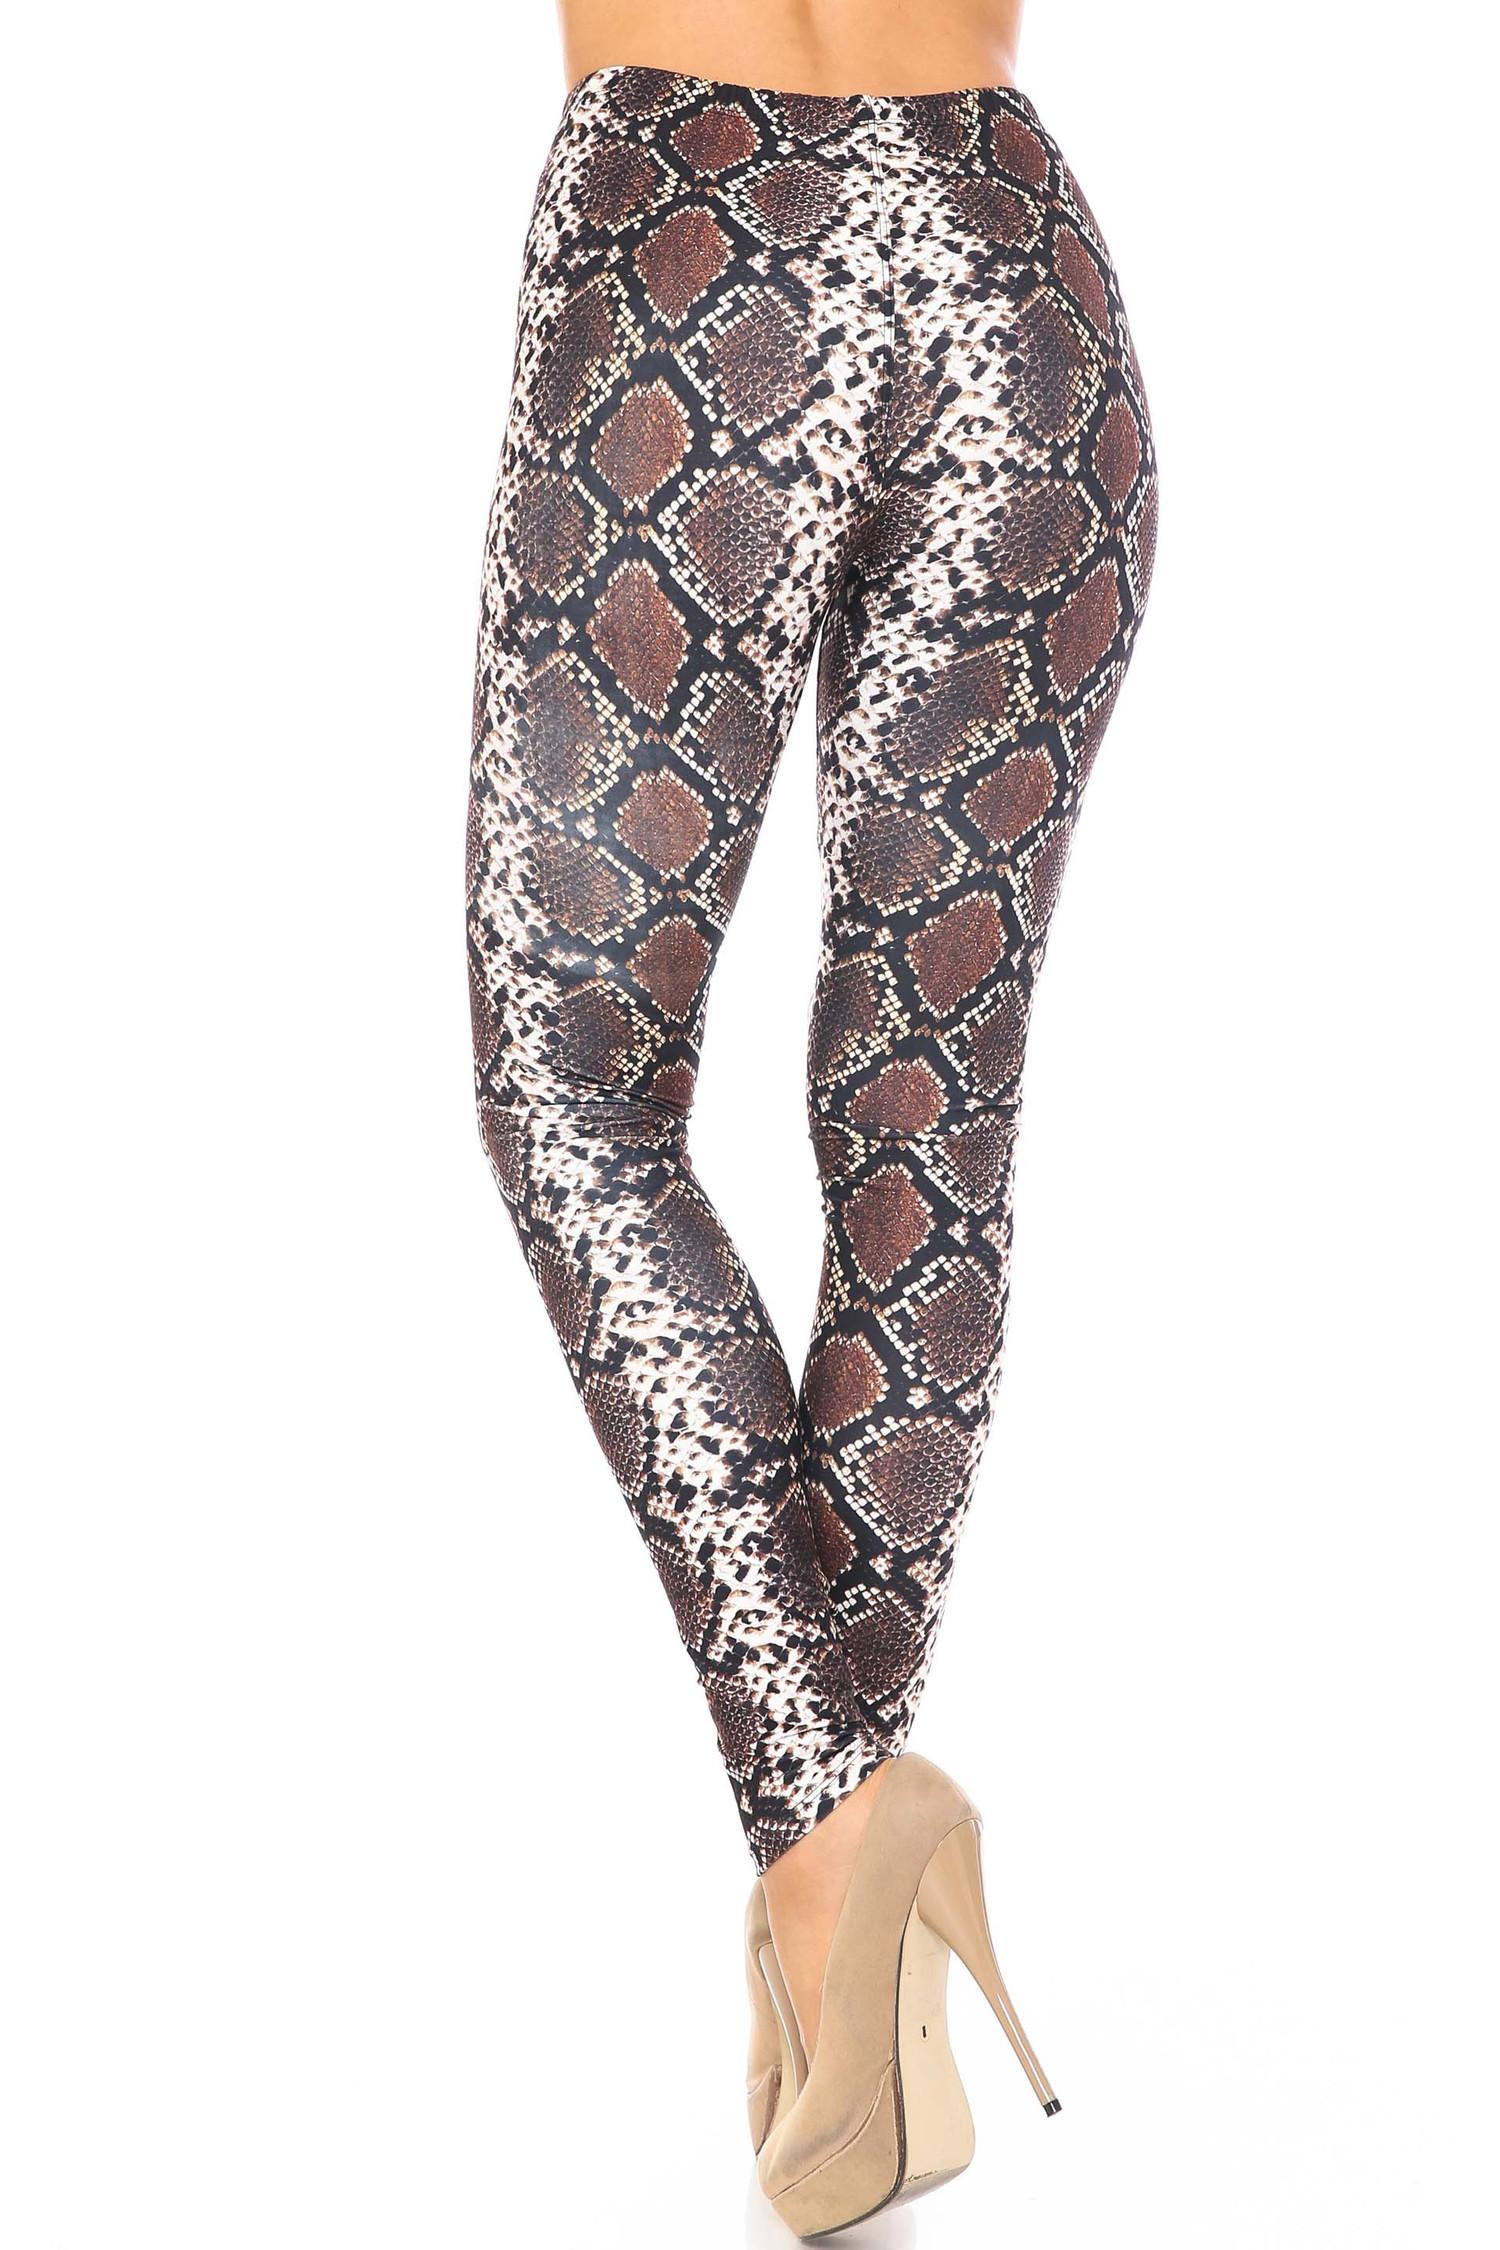 Back side image of Creamy Soft  Brown Boa Snake Leggings - USA Fashion™